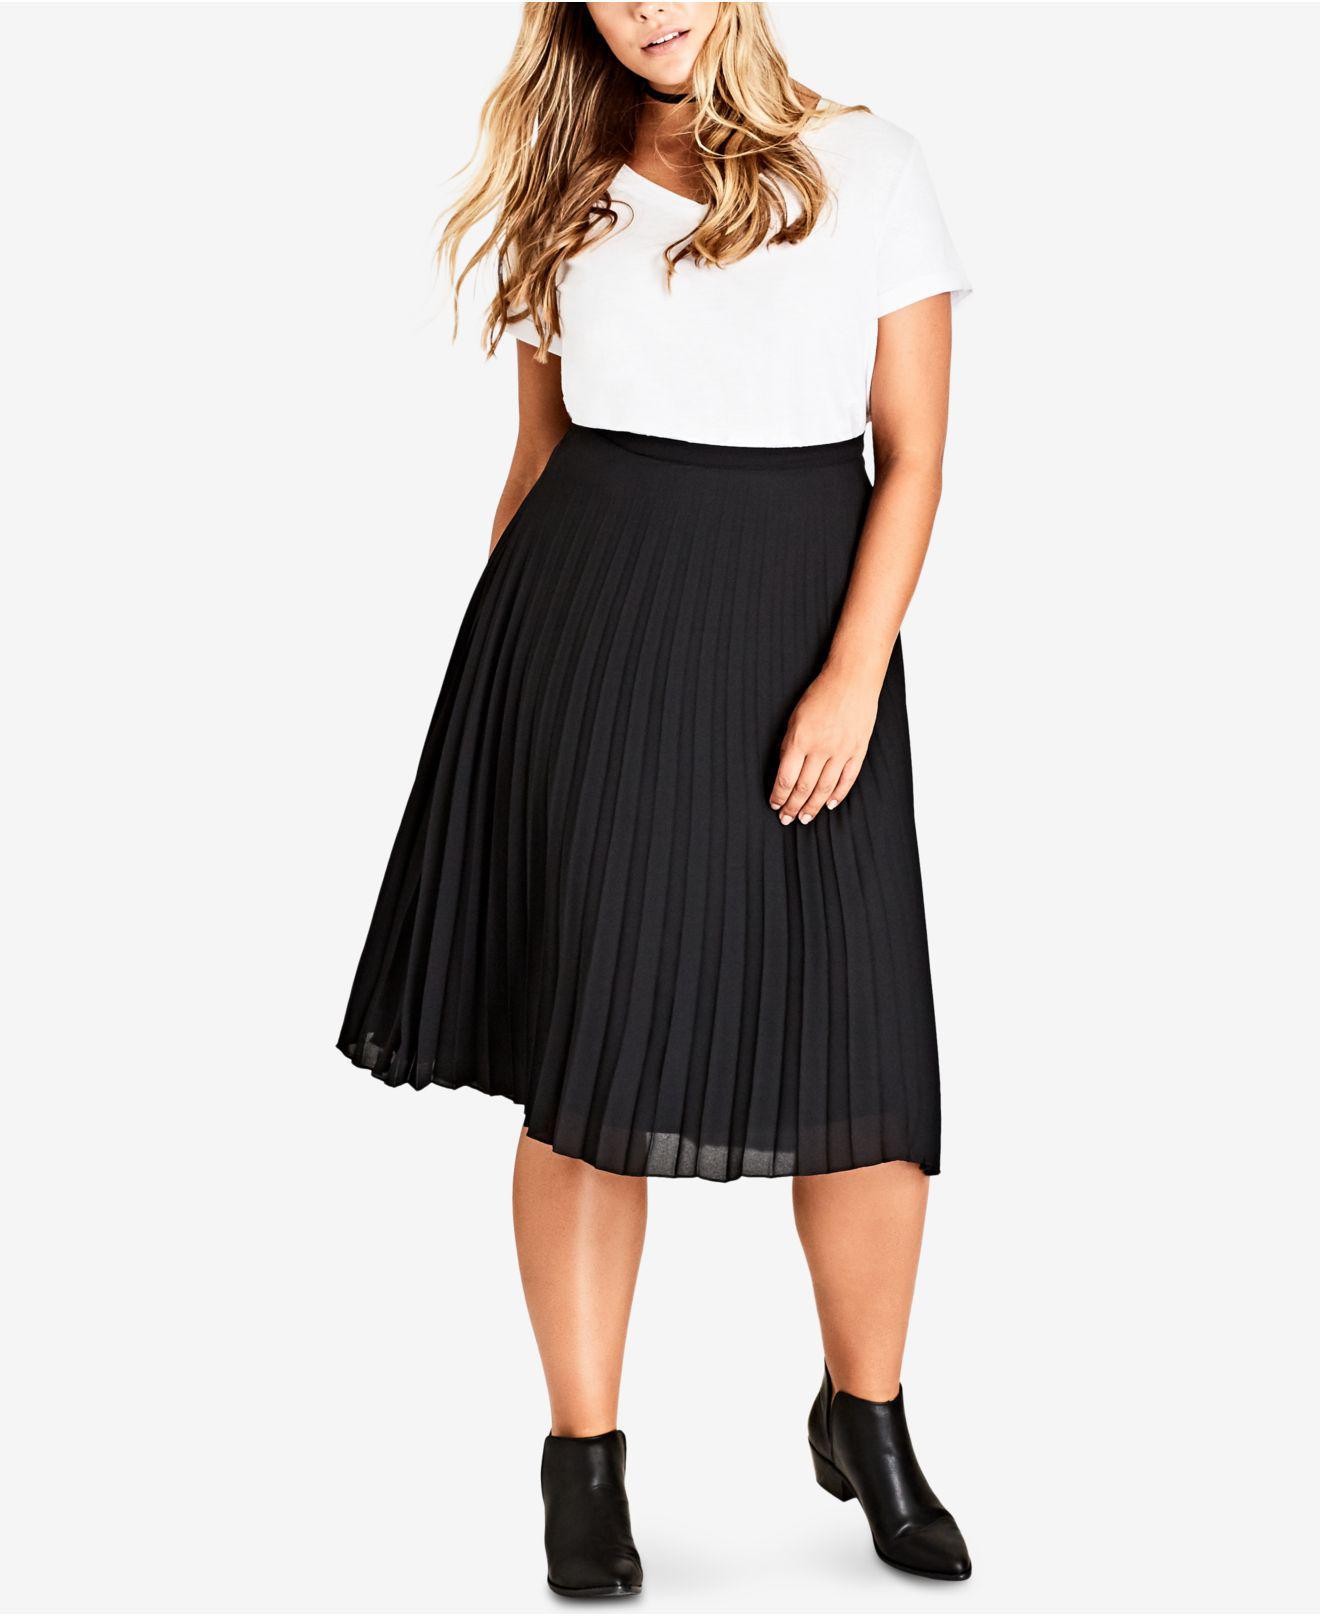 bf578ba32c9df Lyst - City Chic Trendy Plus Size Pleated Chiffon Skirt in Black